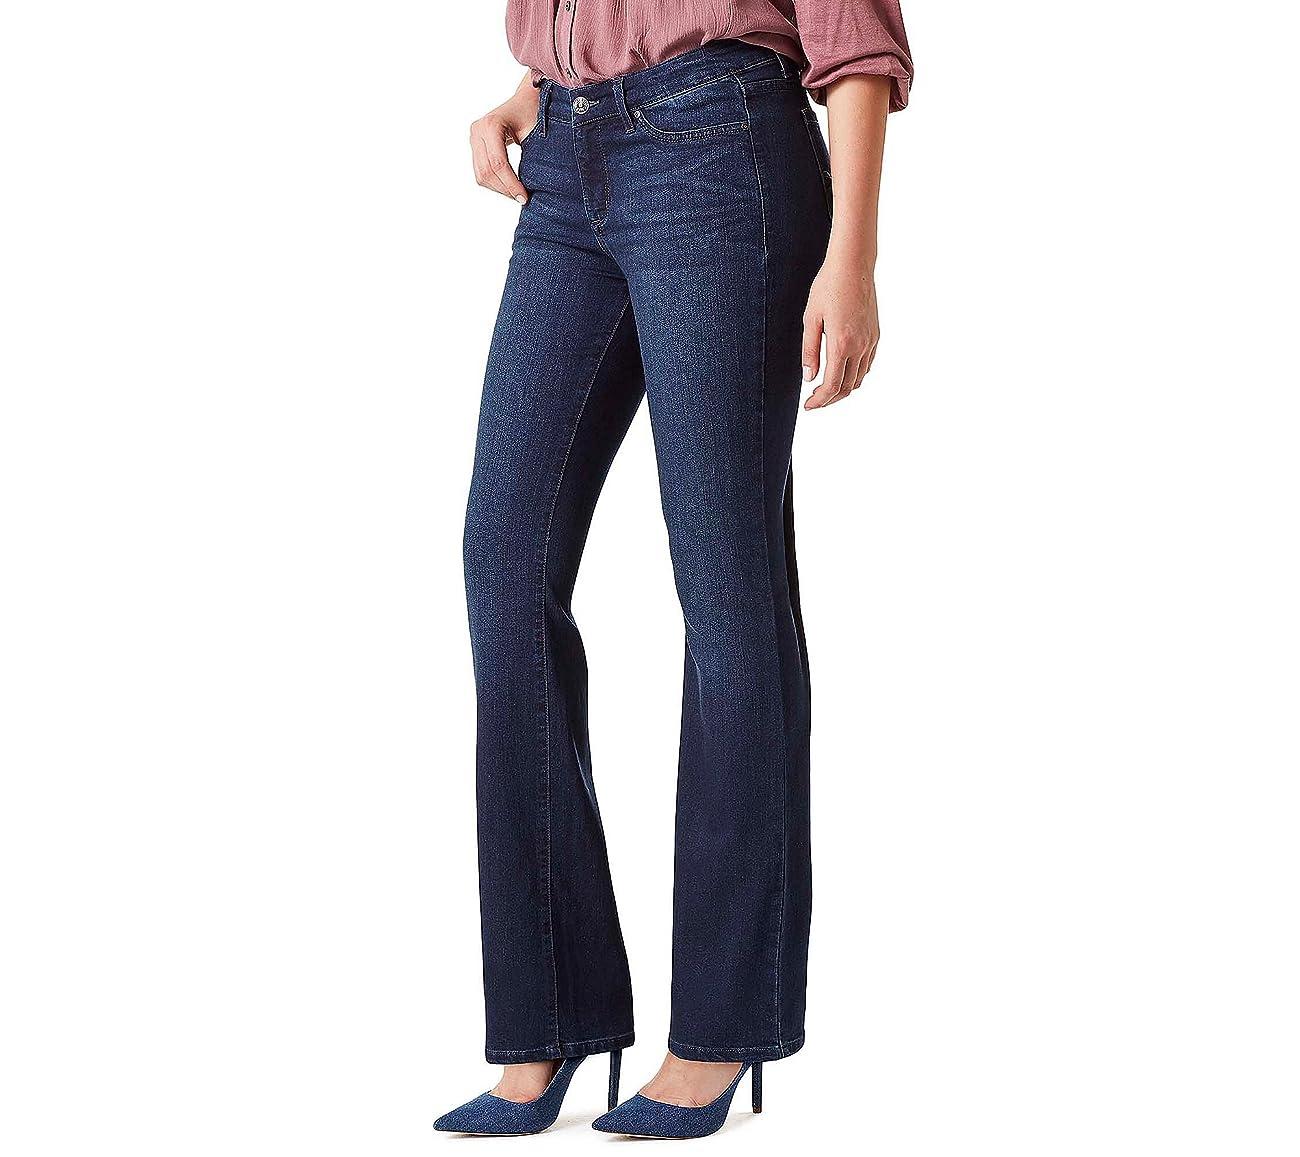 Vintage America Boho Bootcut Jeans 0